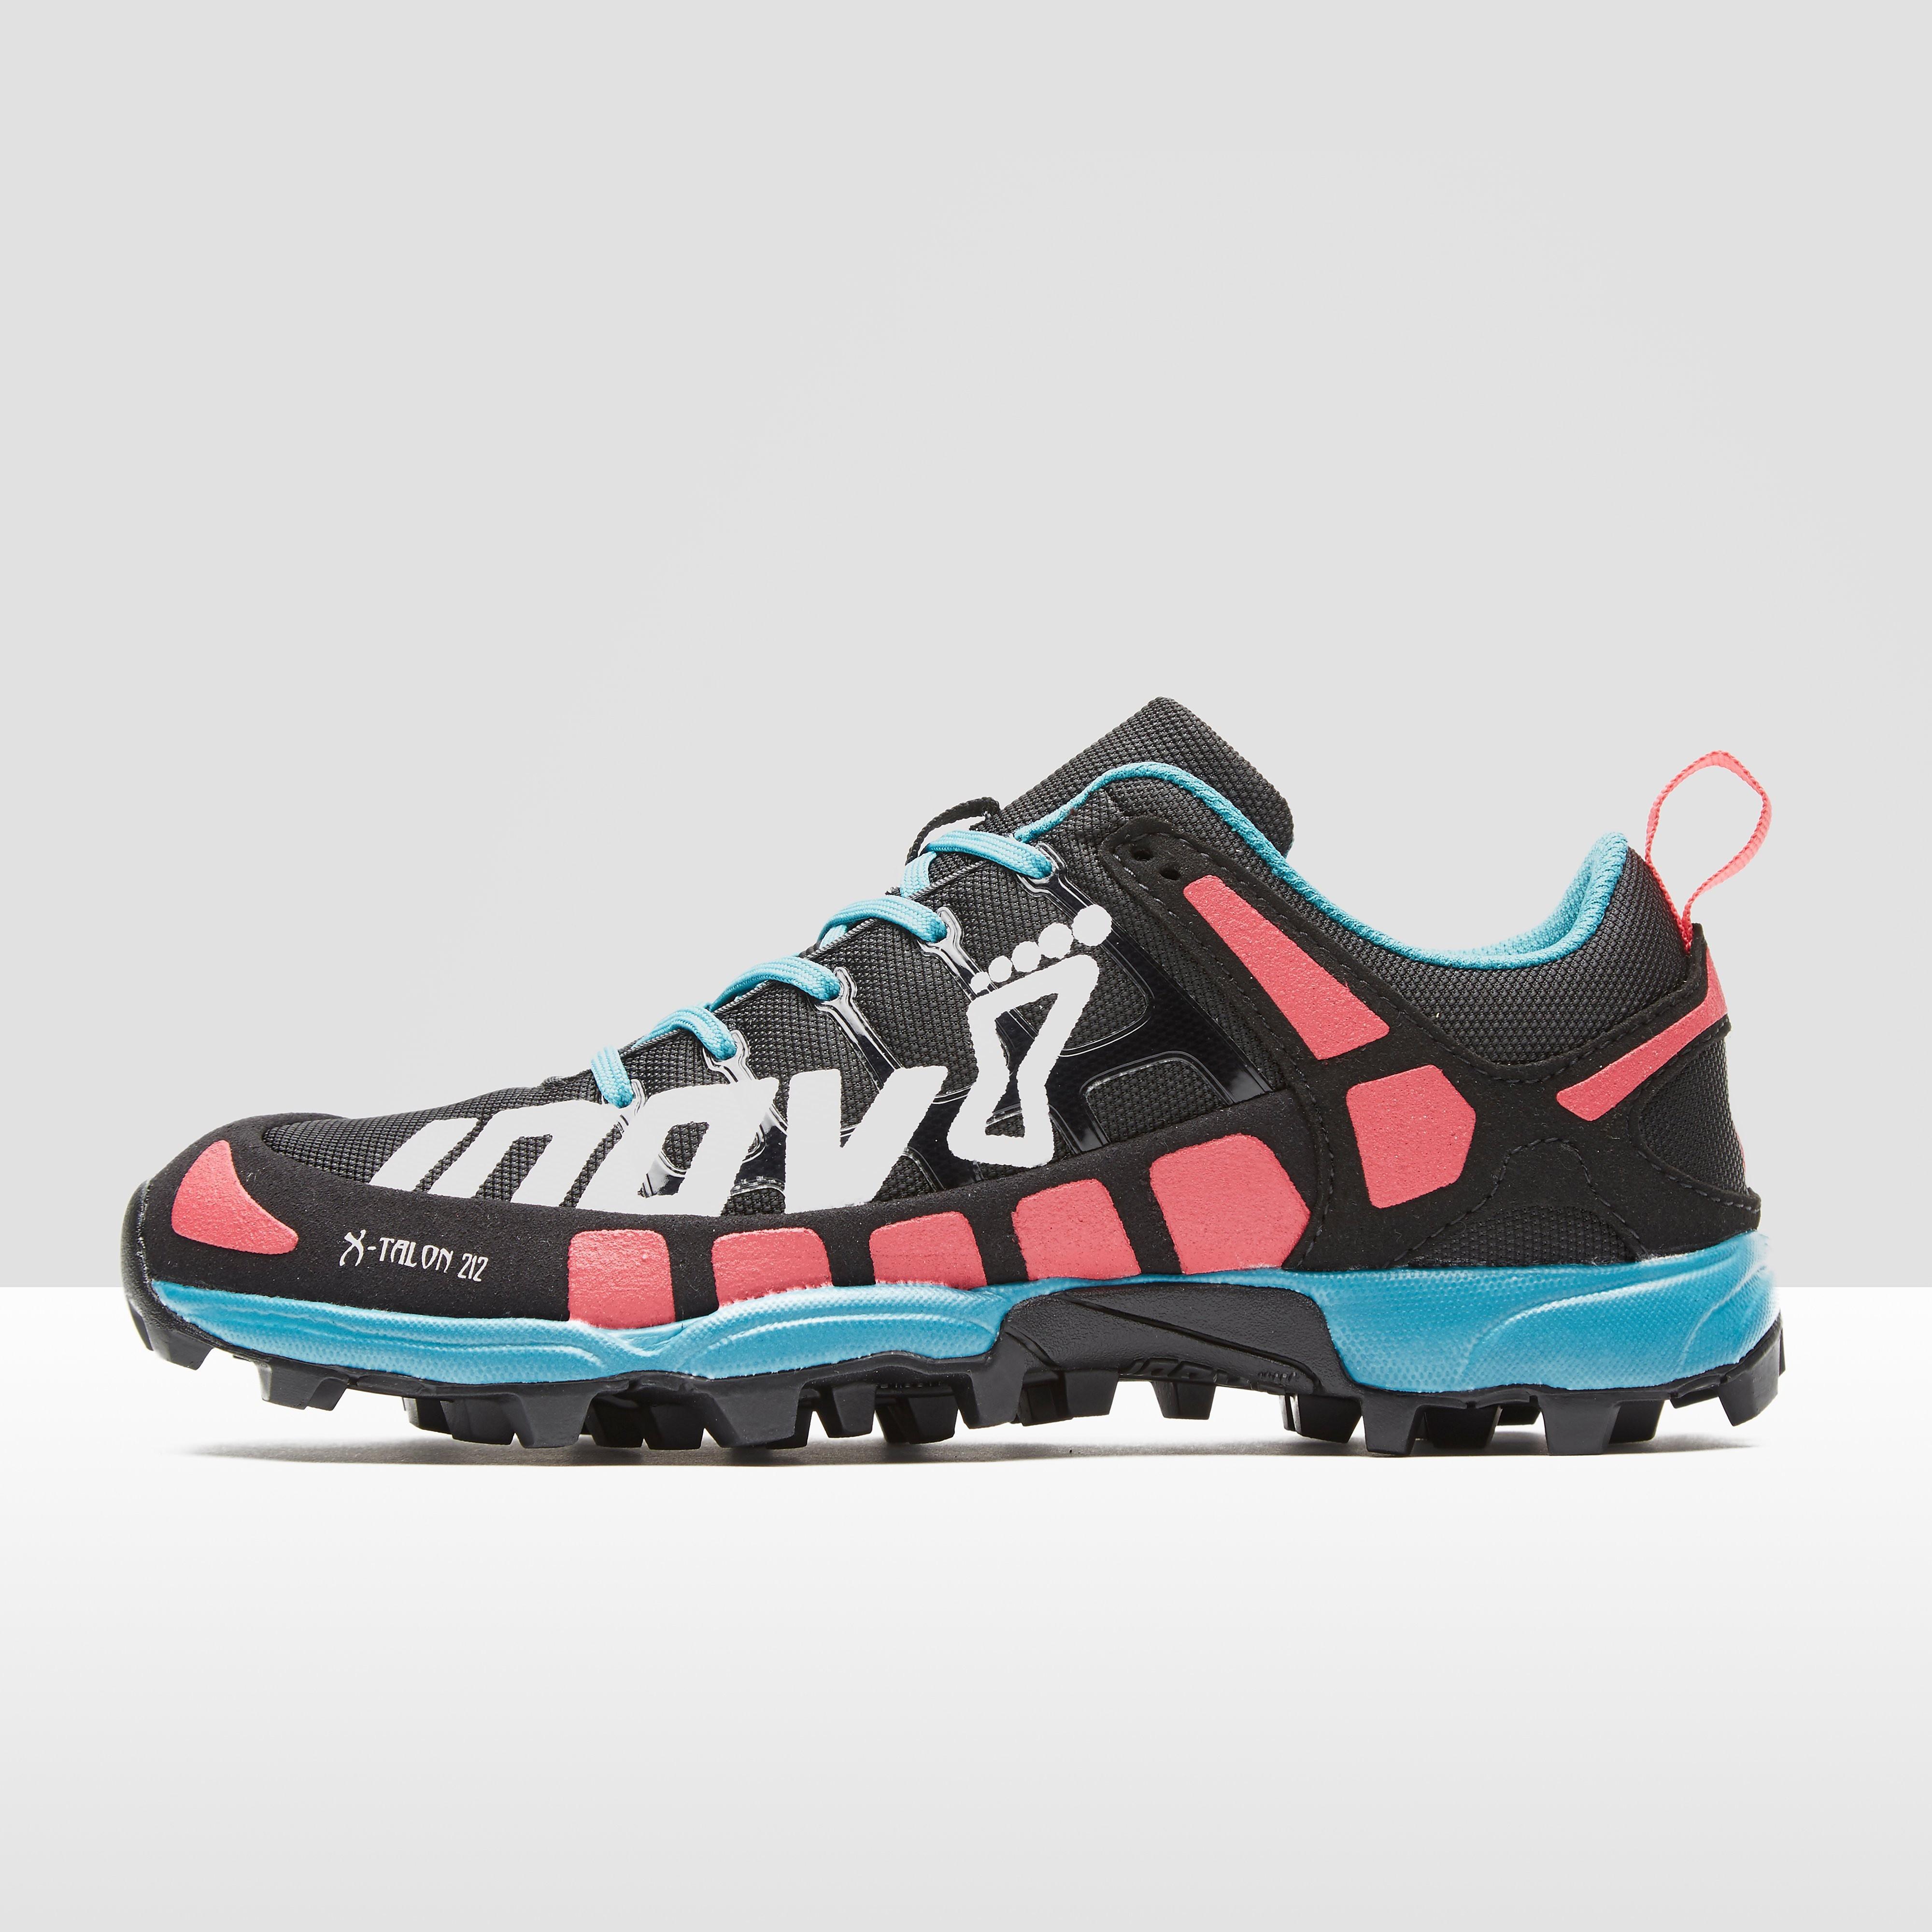 Inov-8 X-Talon 212 Women's Trail Running Shoes